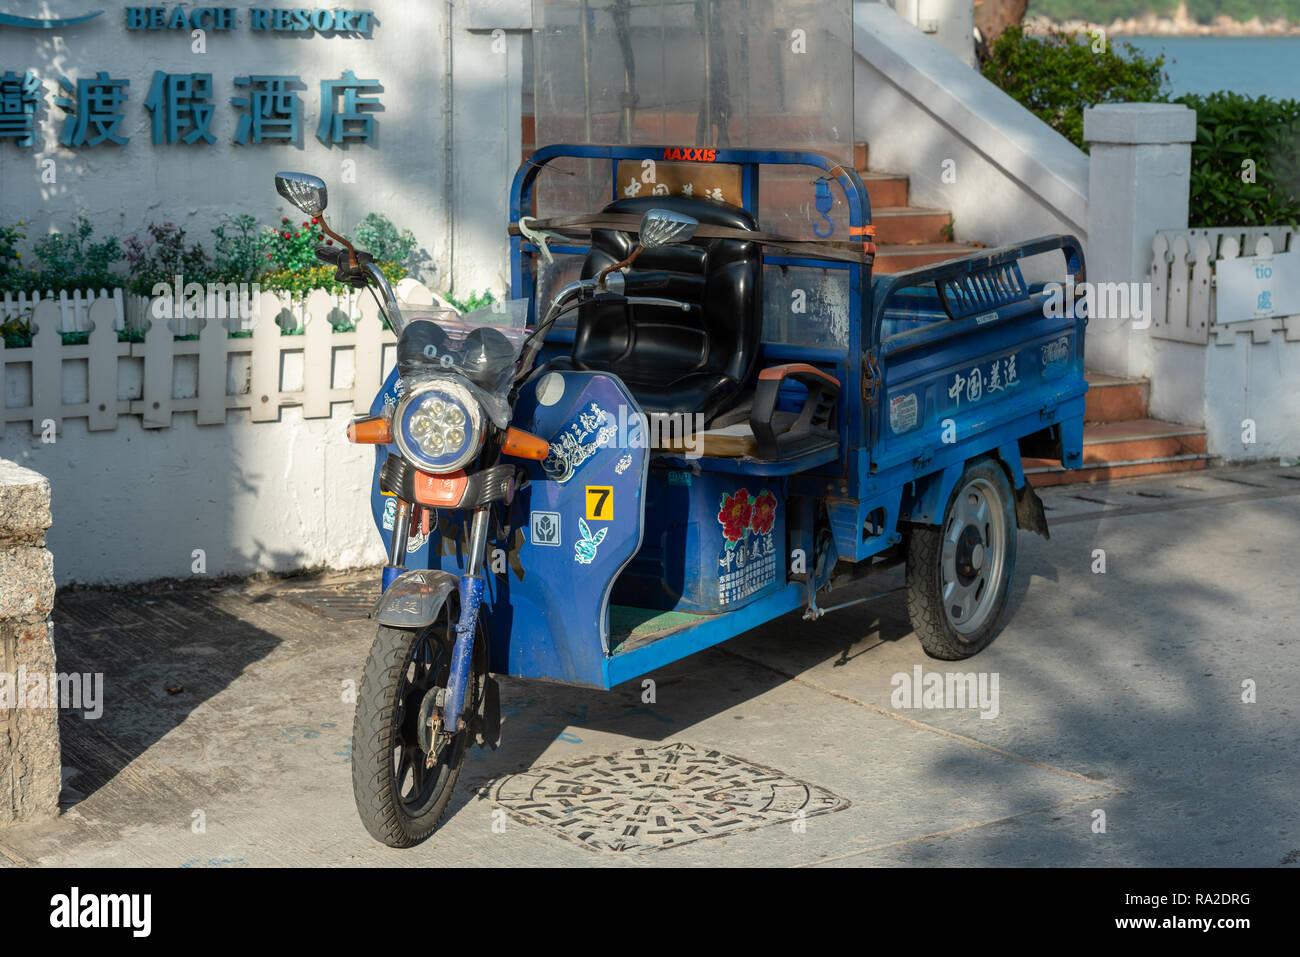 Colourful motorised transport at the Silvermine Beach Resort at Mui Wo on Lantau Island, Hong Kong - Stock Image